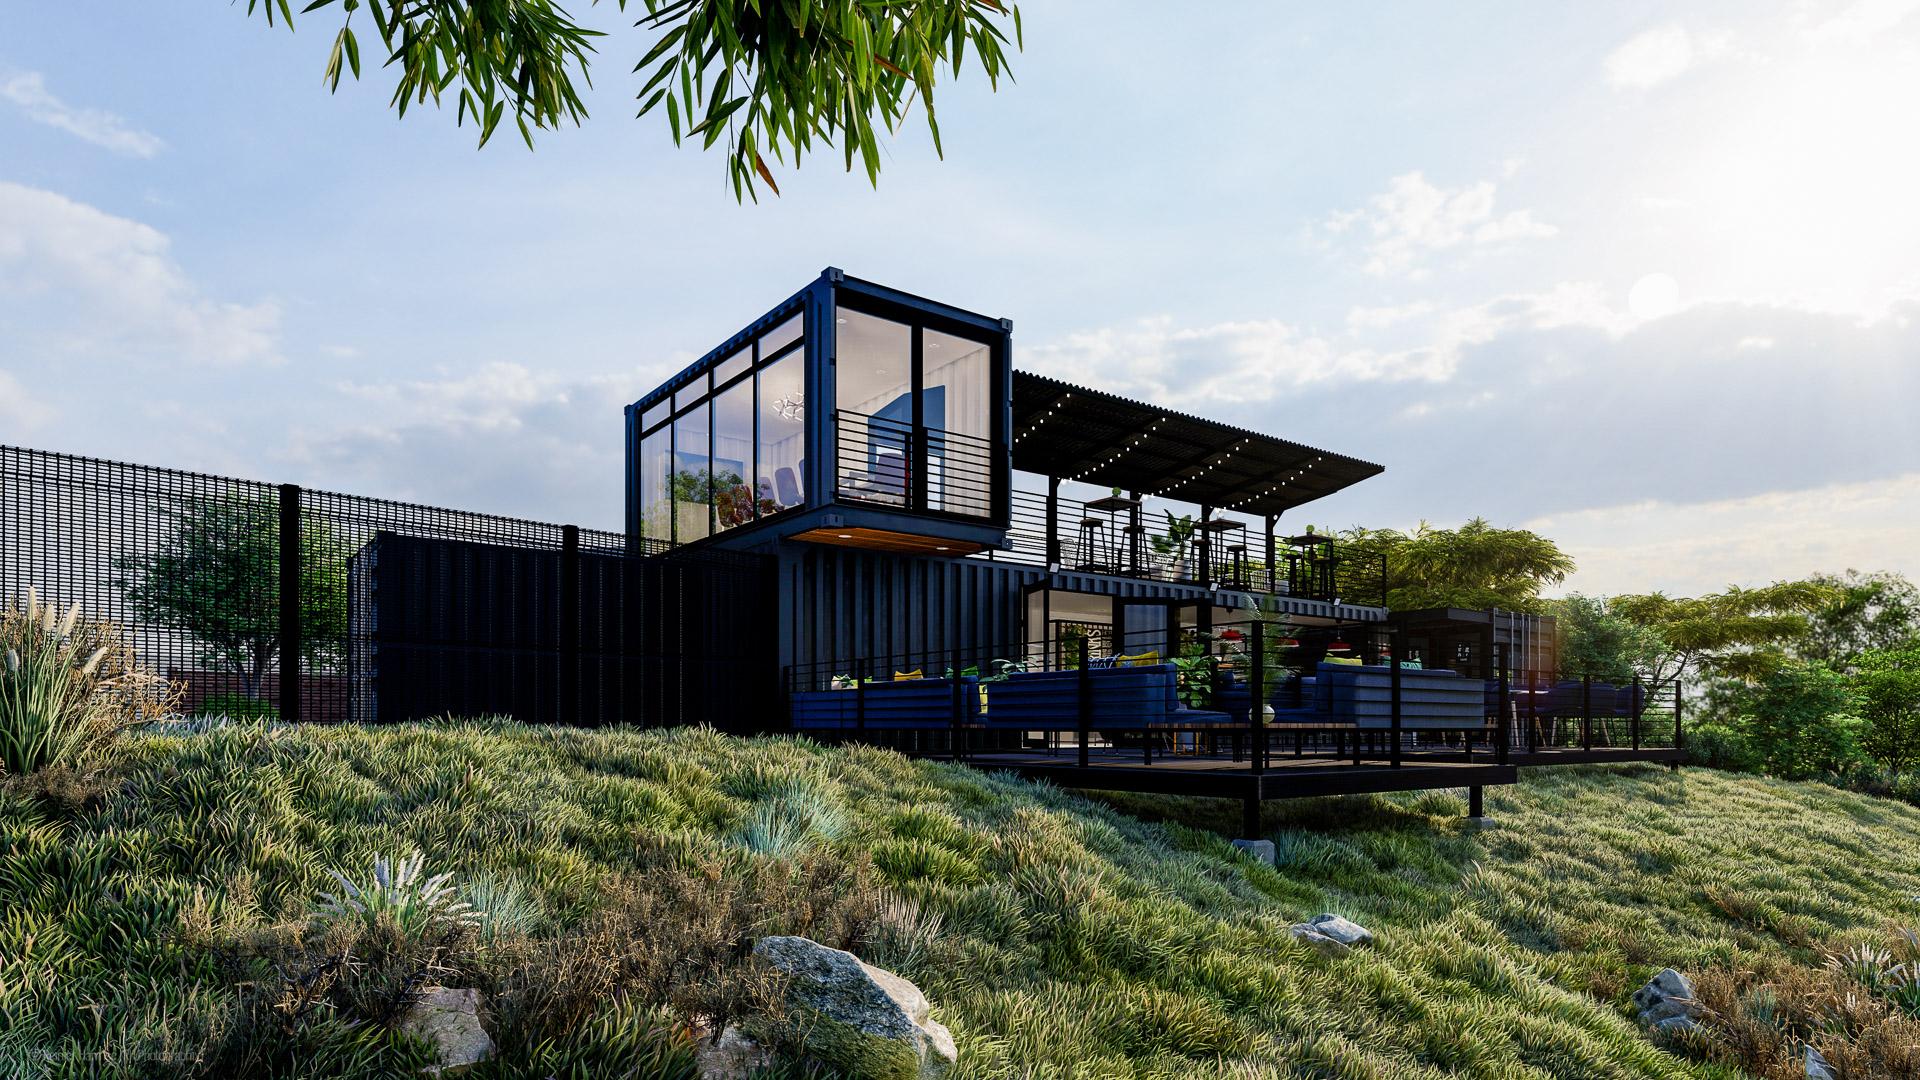 RHPX_Portfolio_LVR Container Restaurant-7